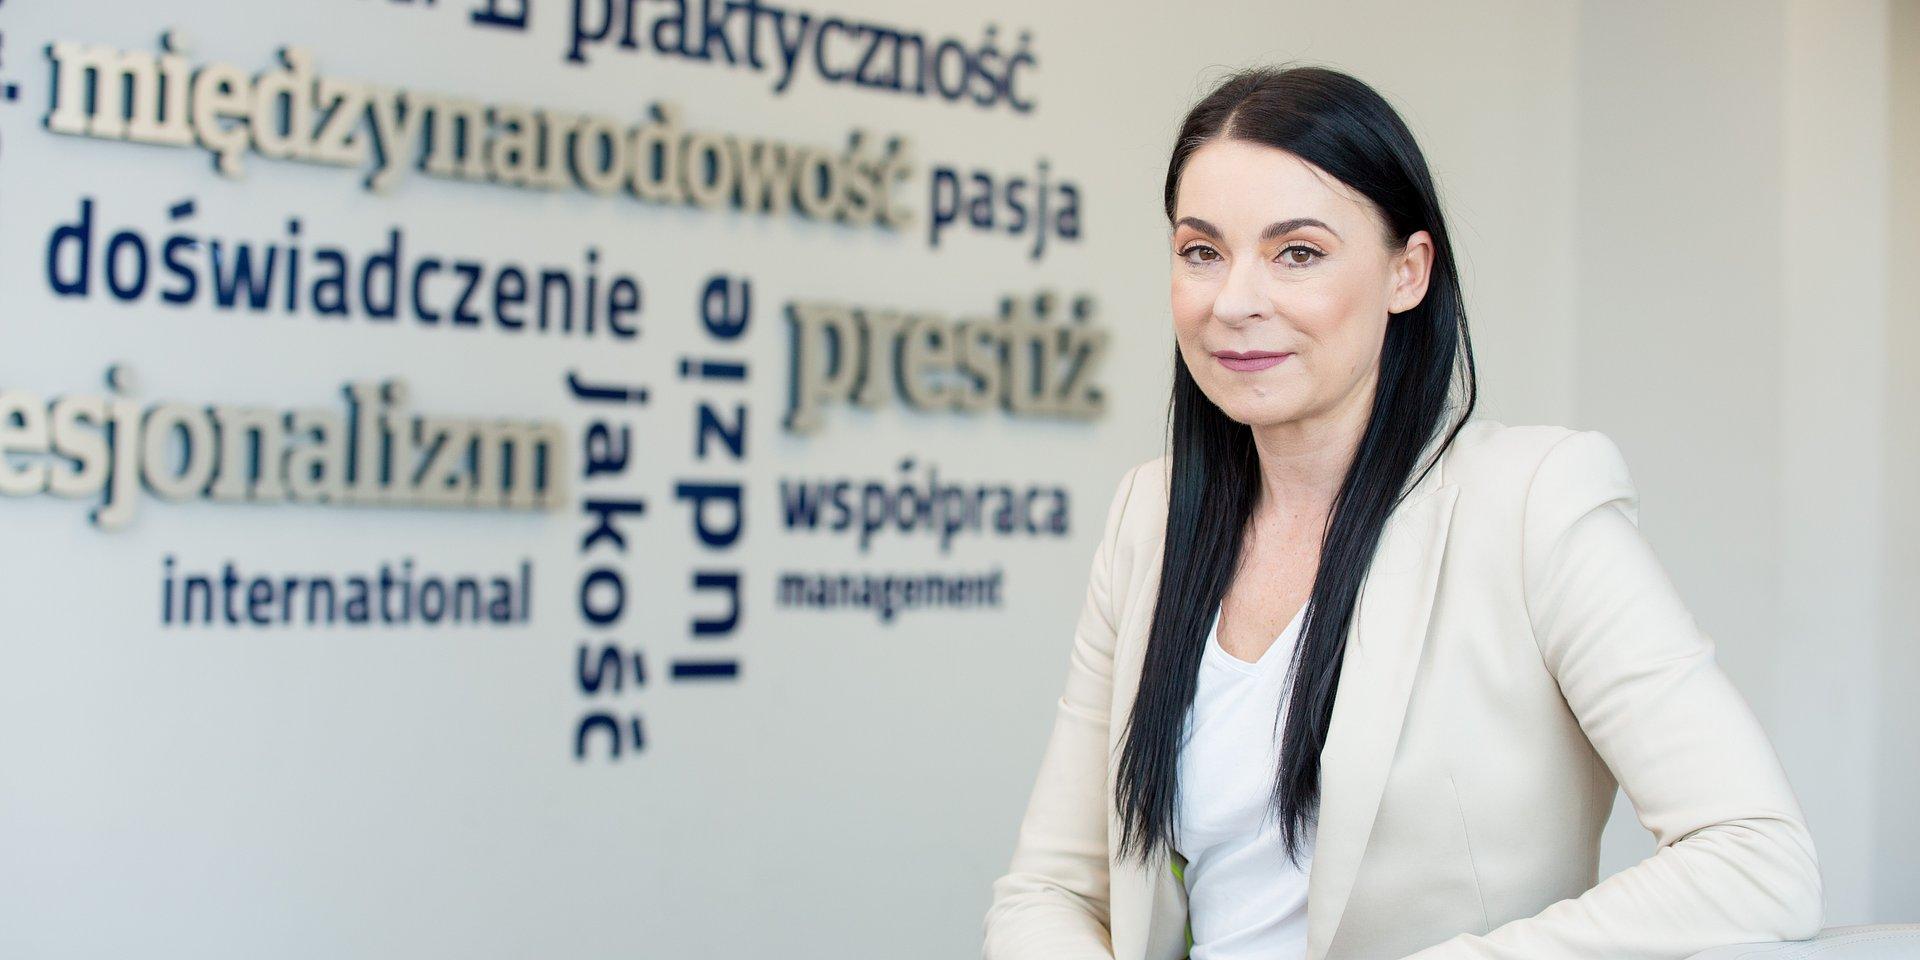 psychologia: dr Agnieszka Gawor